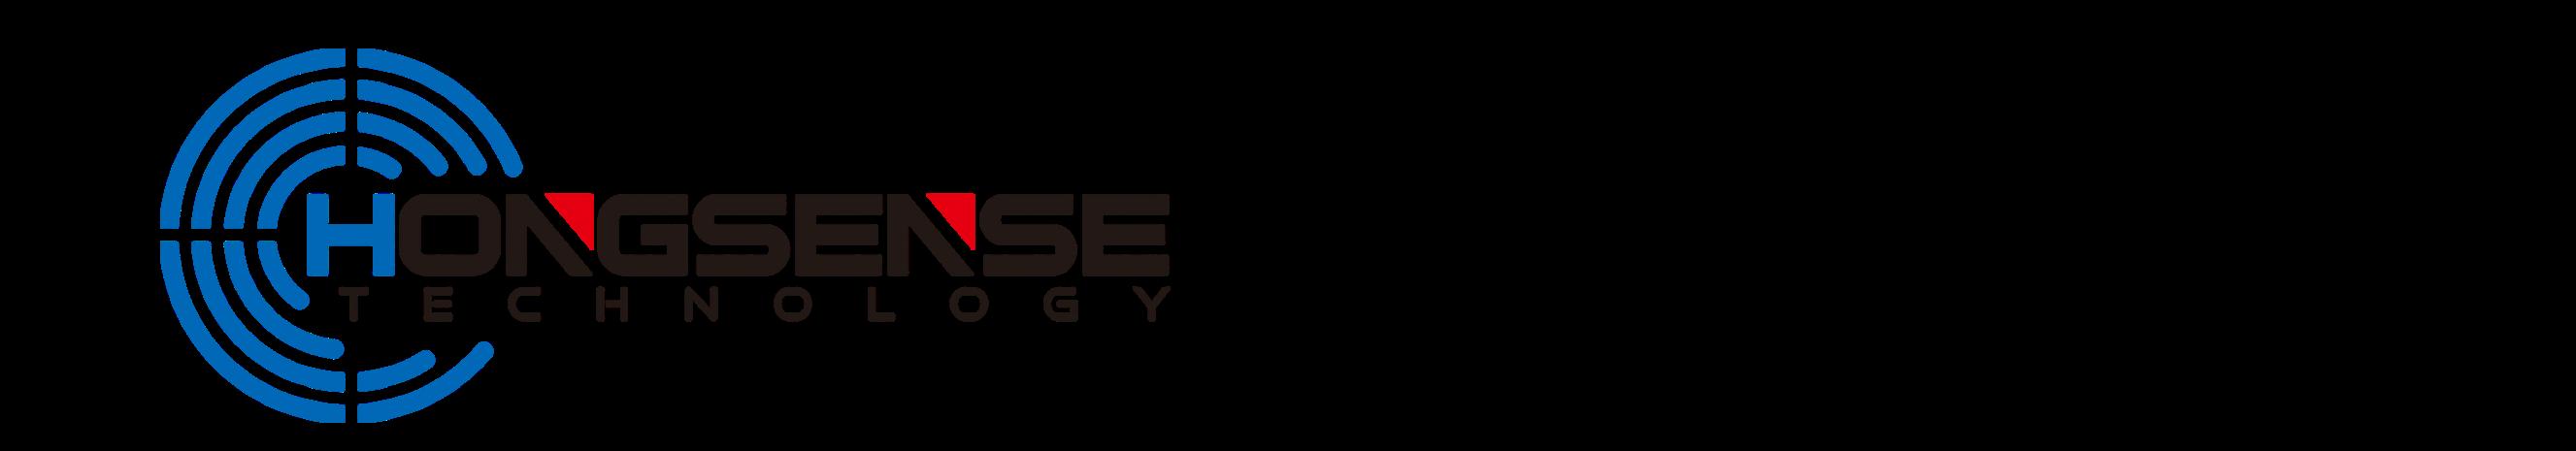 SHENZHEN HONGSENSE TECHNOLOGY CO.,LTD